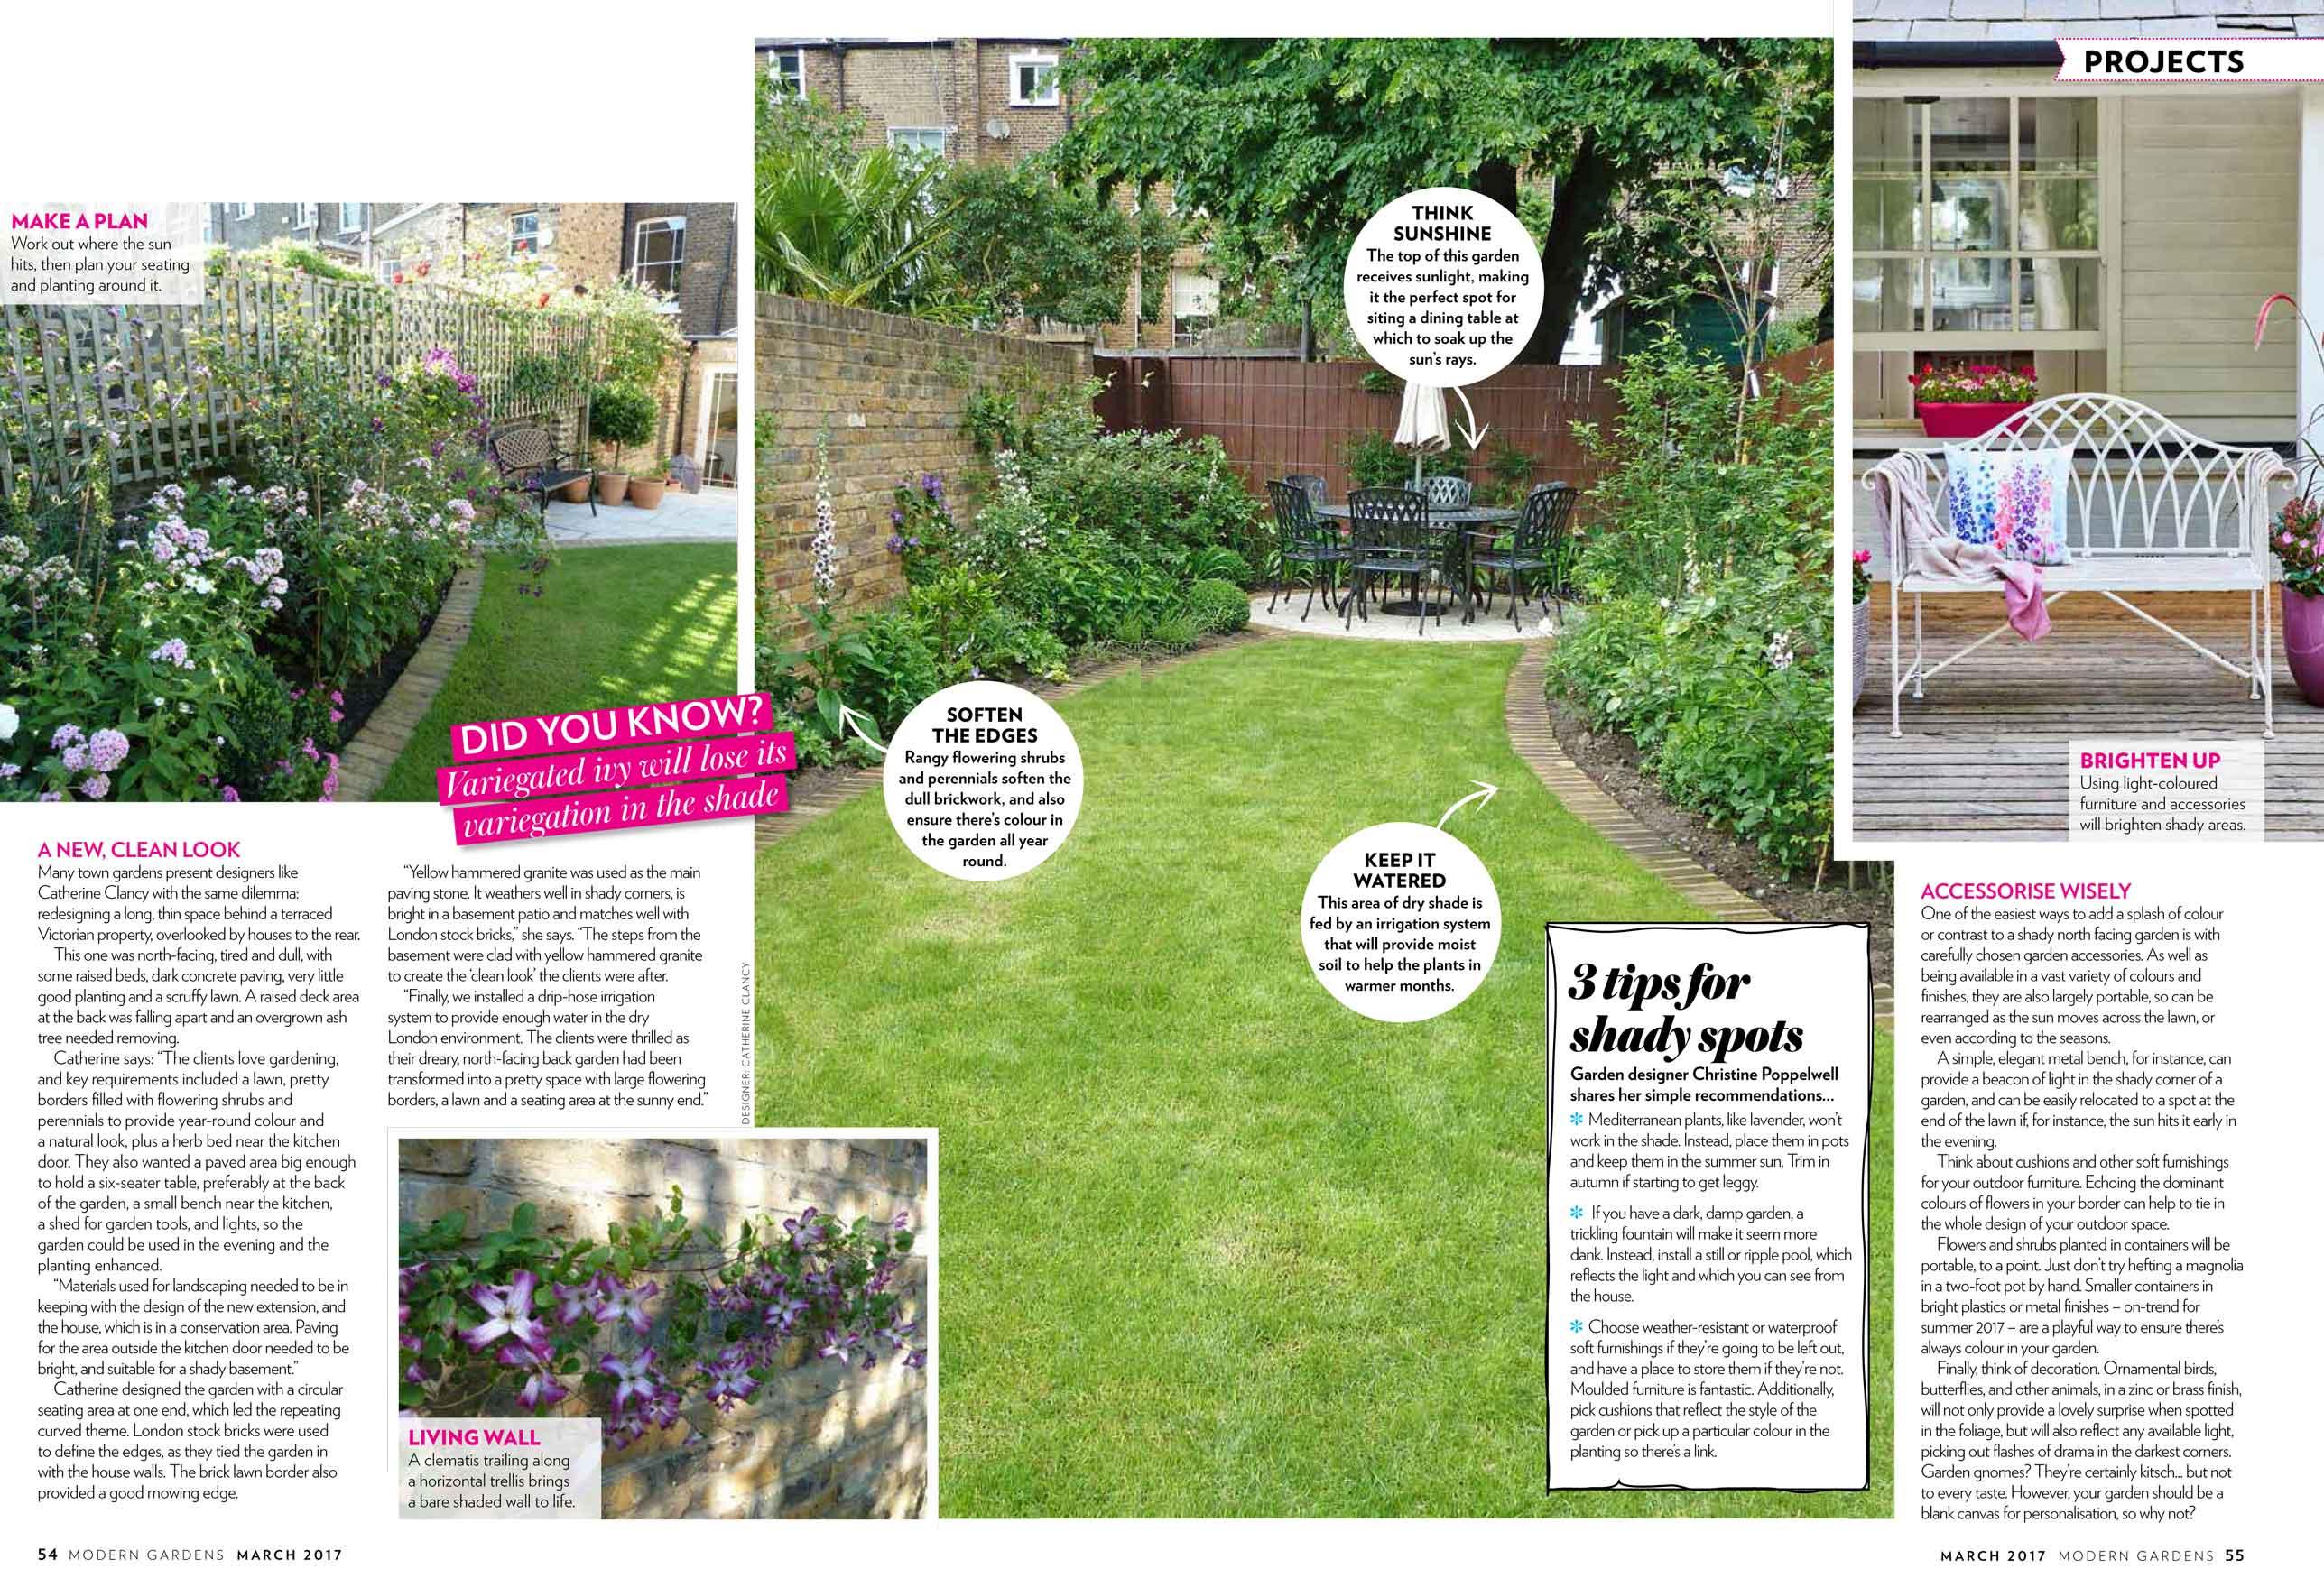 north facing gardens - Garden Design London - Catherine Clancy